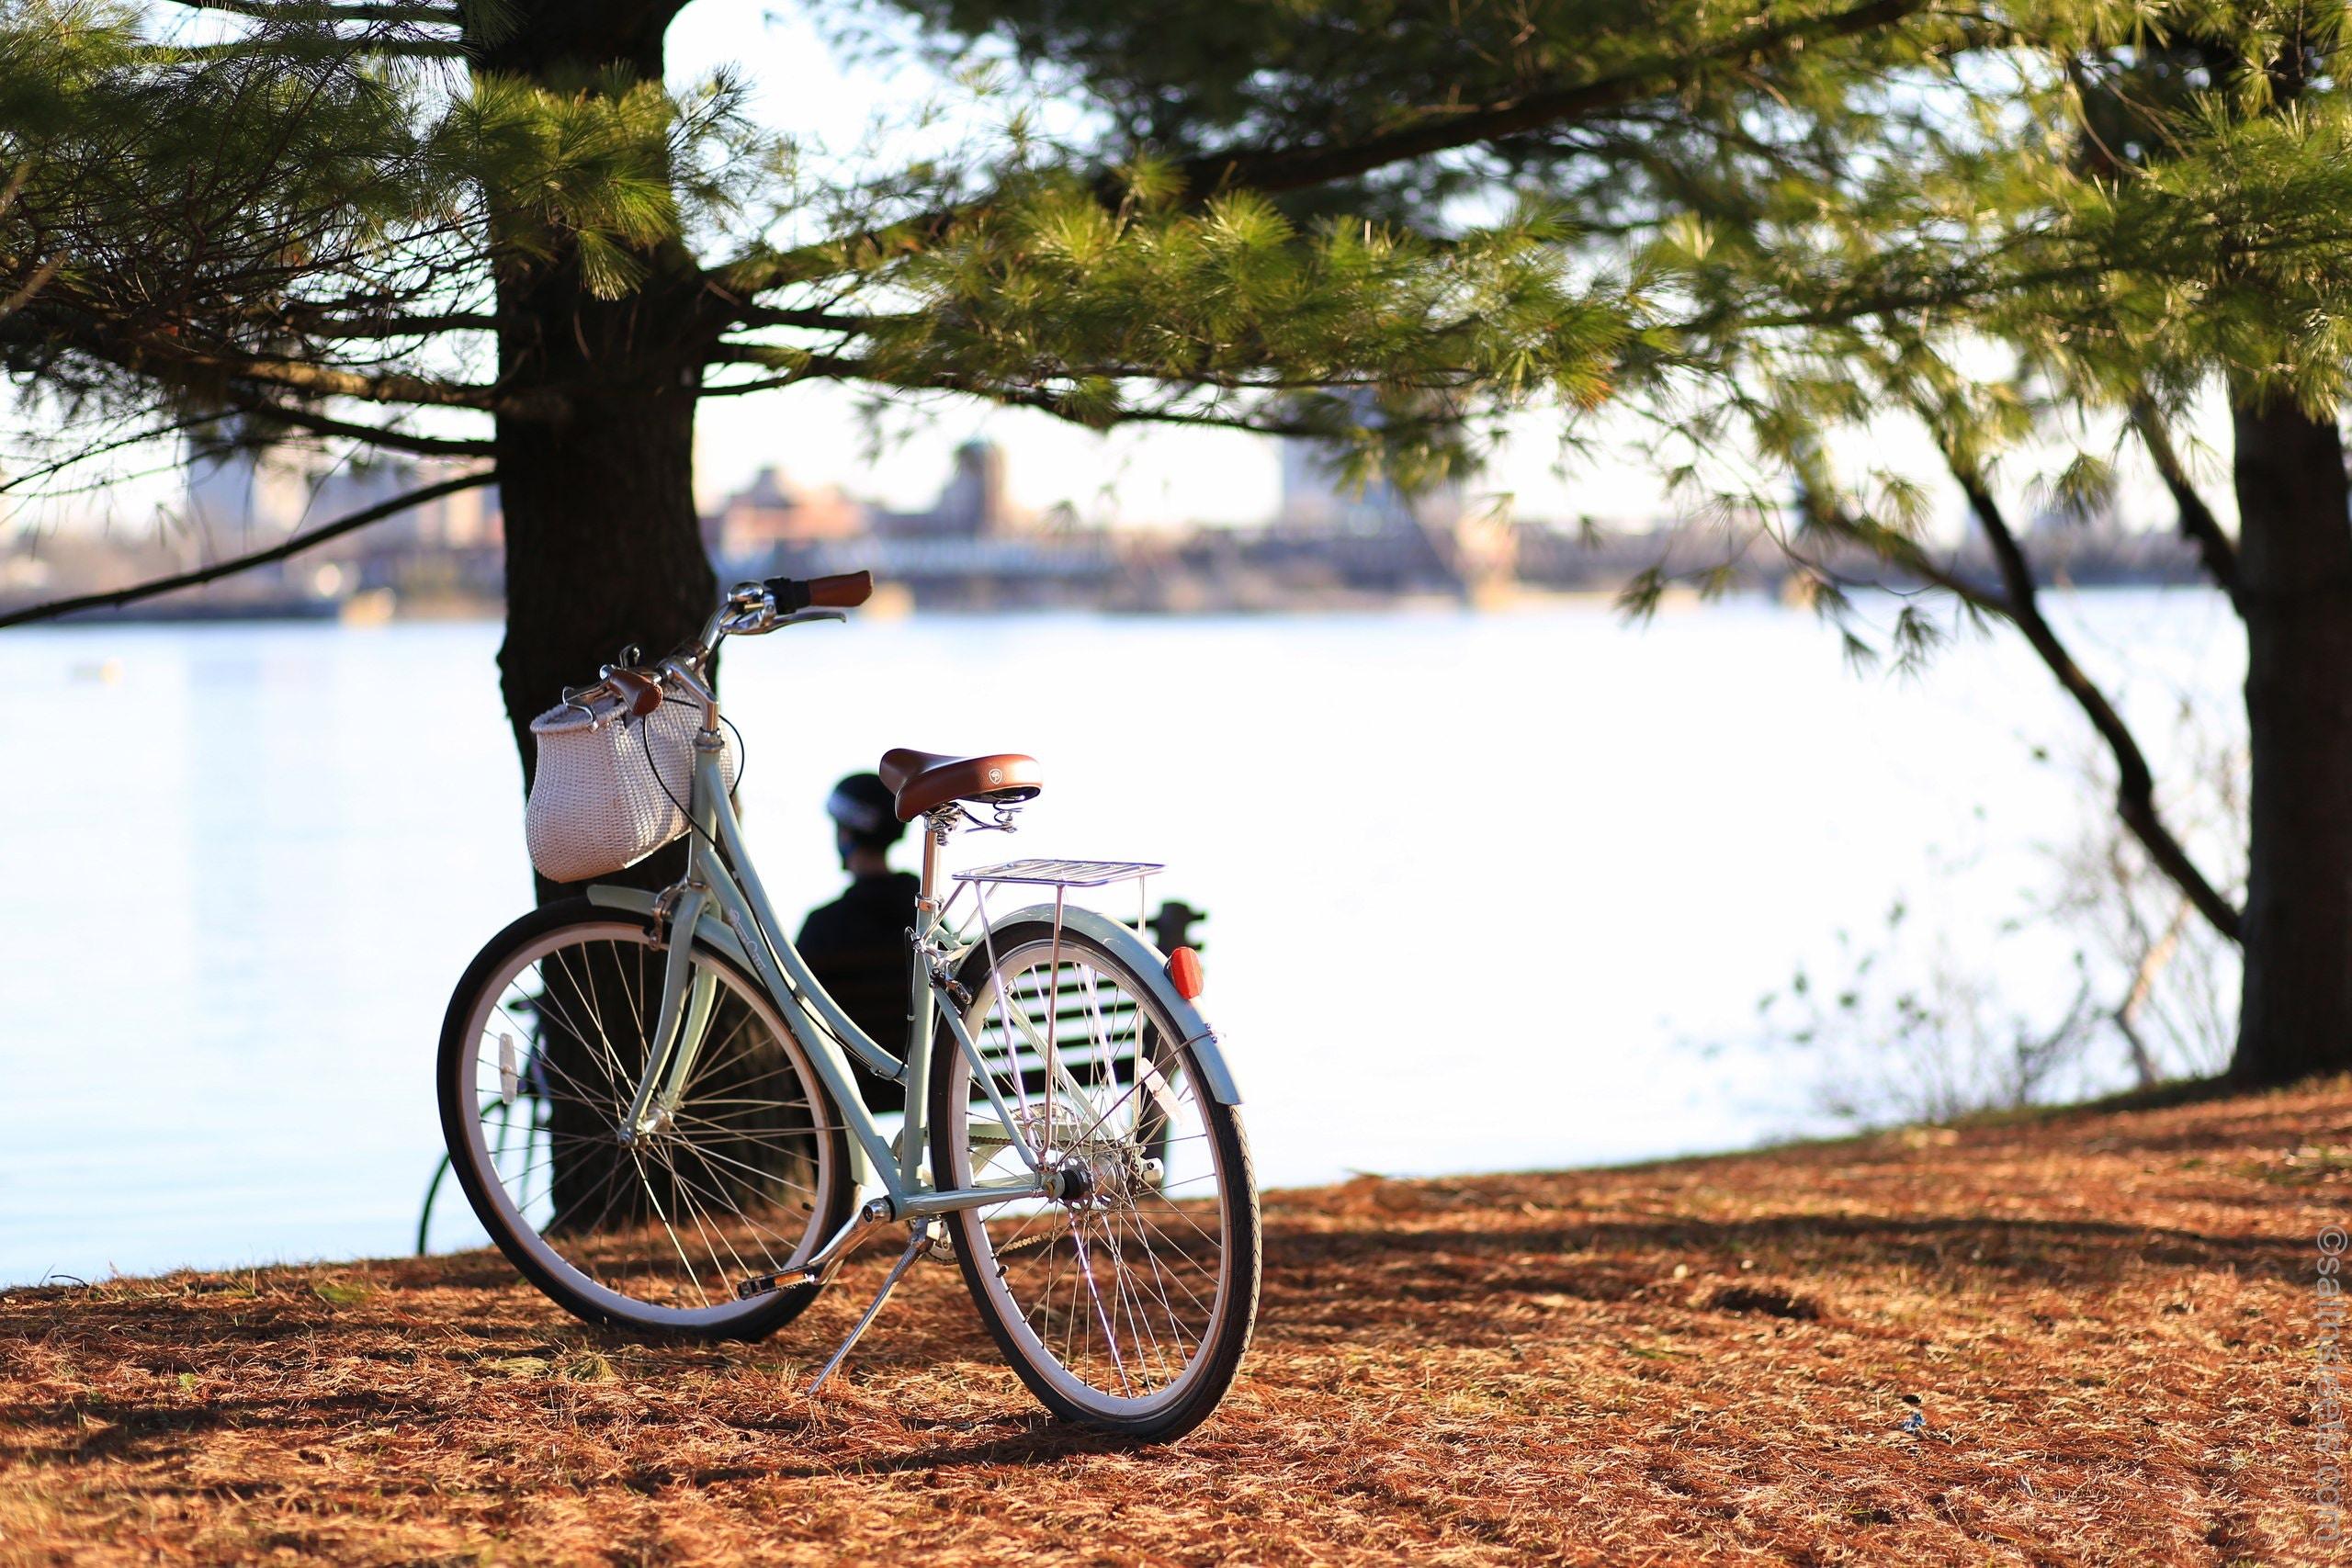 Fiesnetwerk fiets route